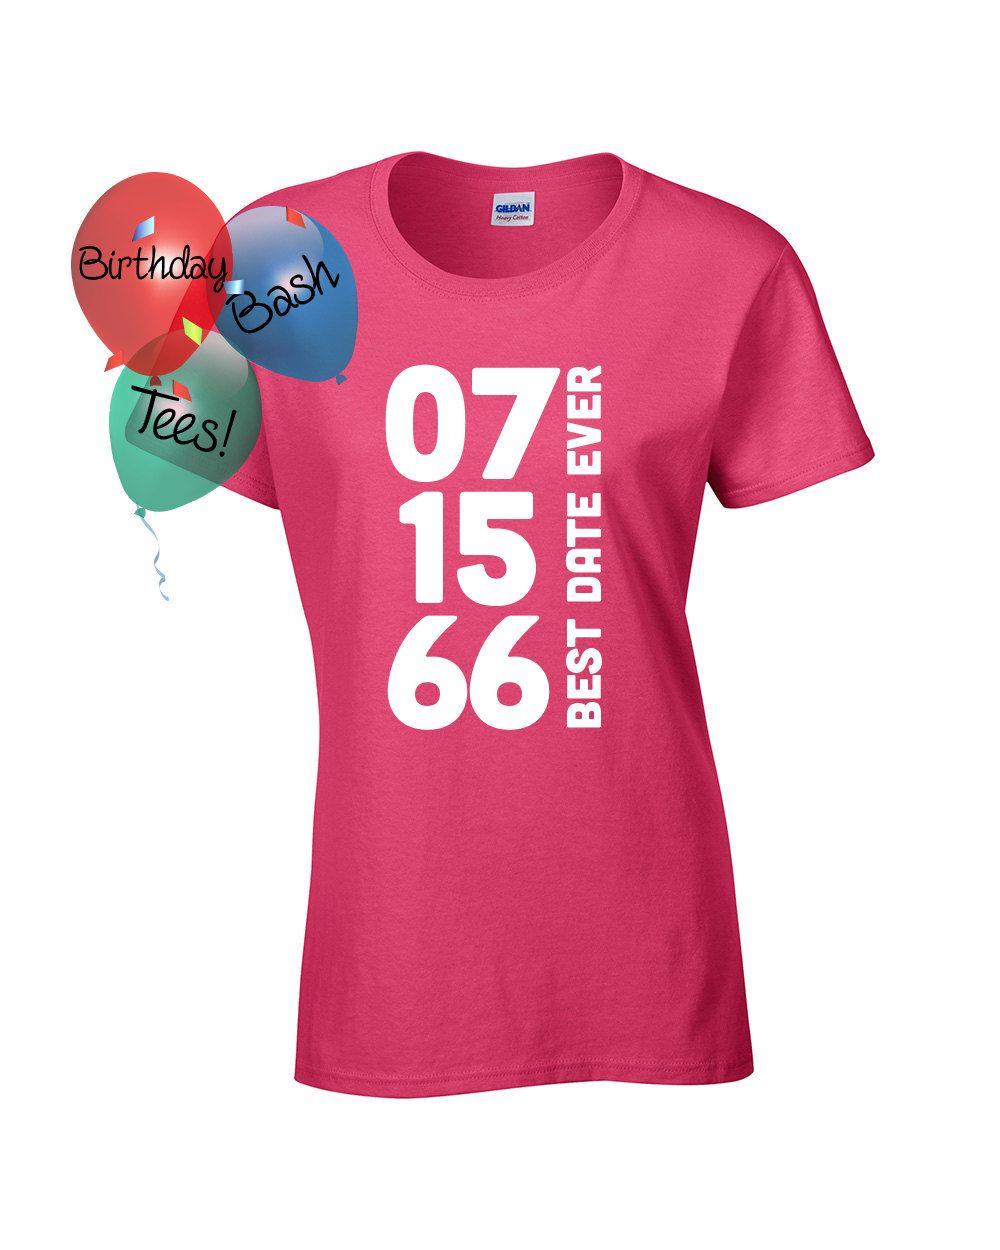 Pin By Best Shirts Shirt For Men On Shirt Ideas Custom Birthday Shirts Personalized Shirts Custom Mens Shirts